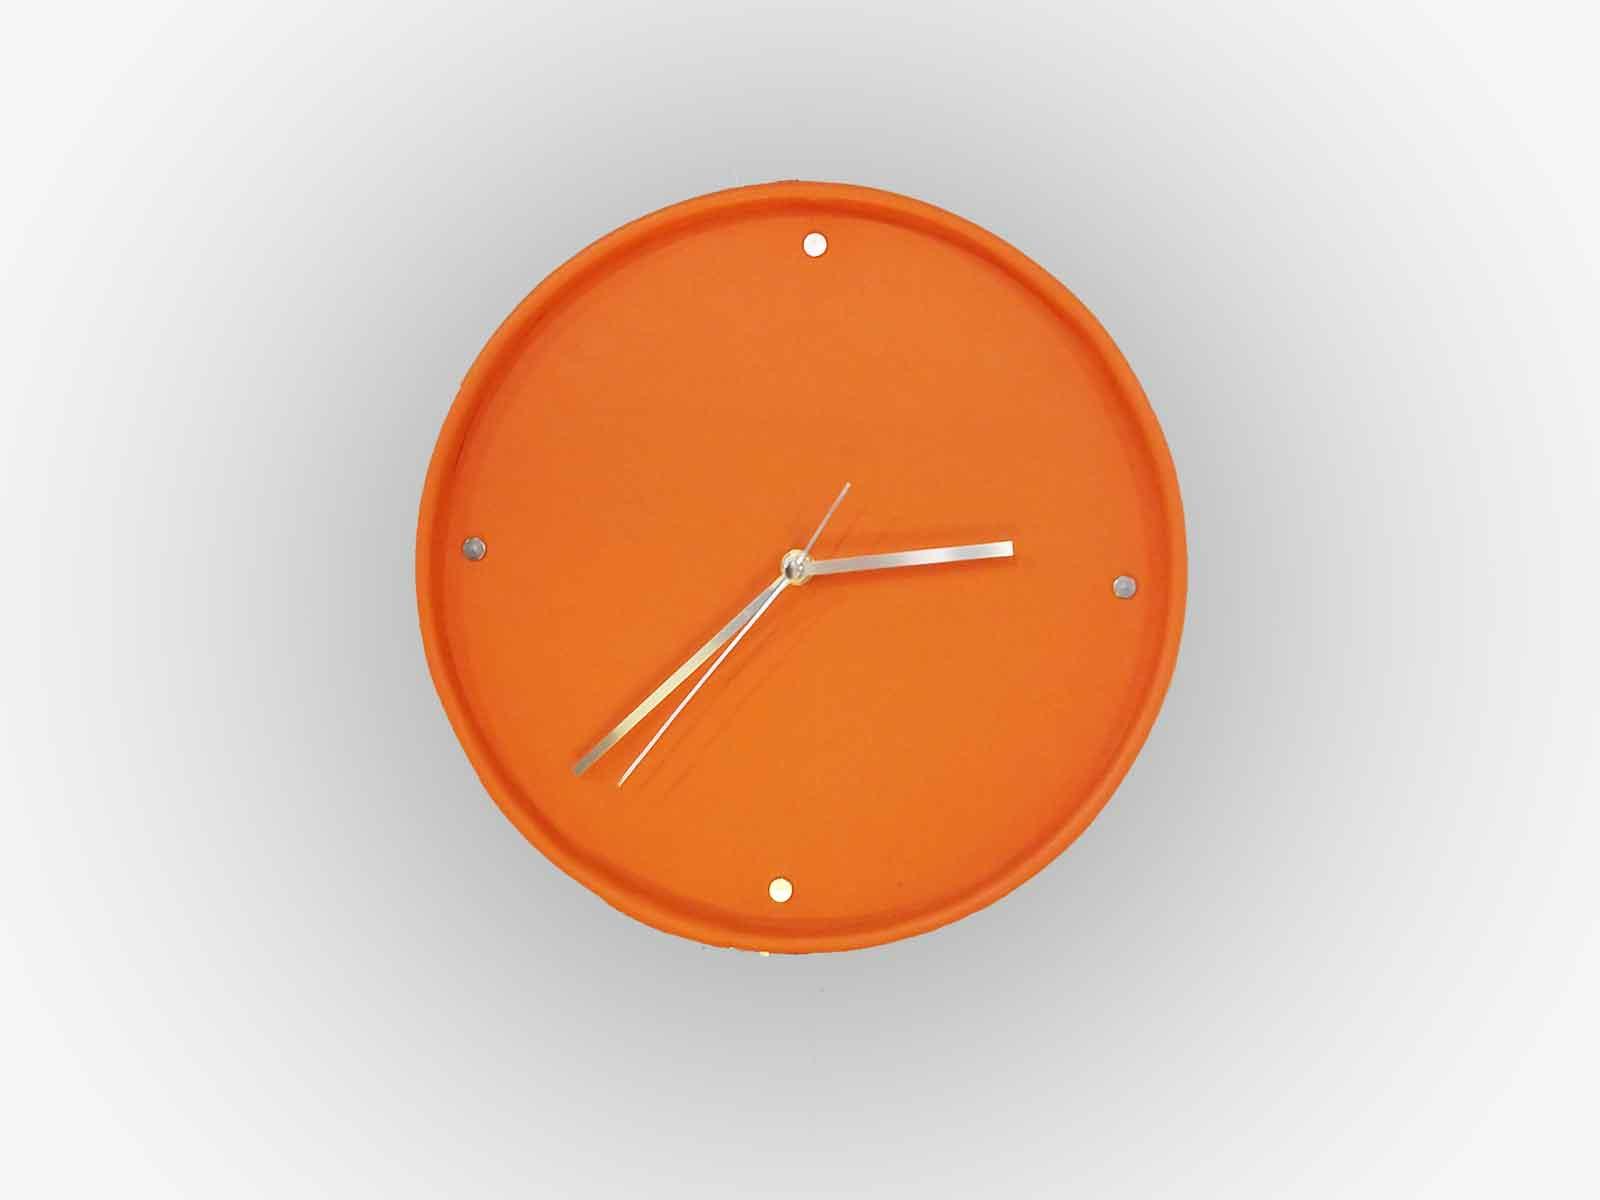 SETO, horloge murale en cuir de veau orange